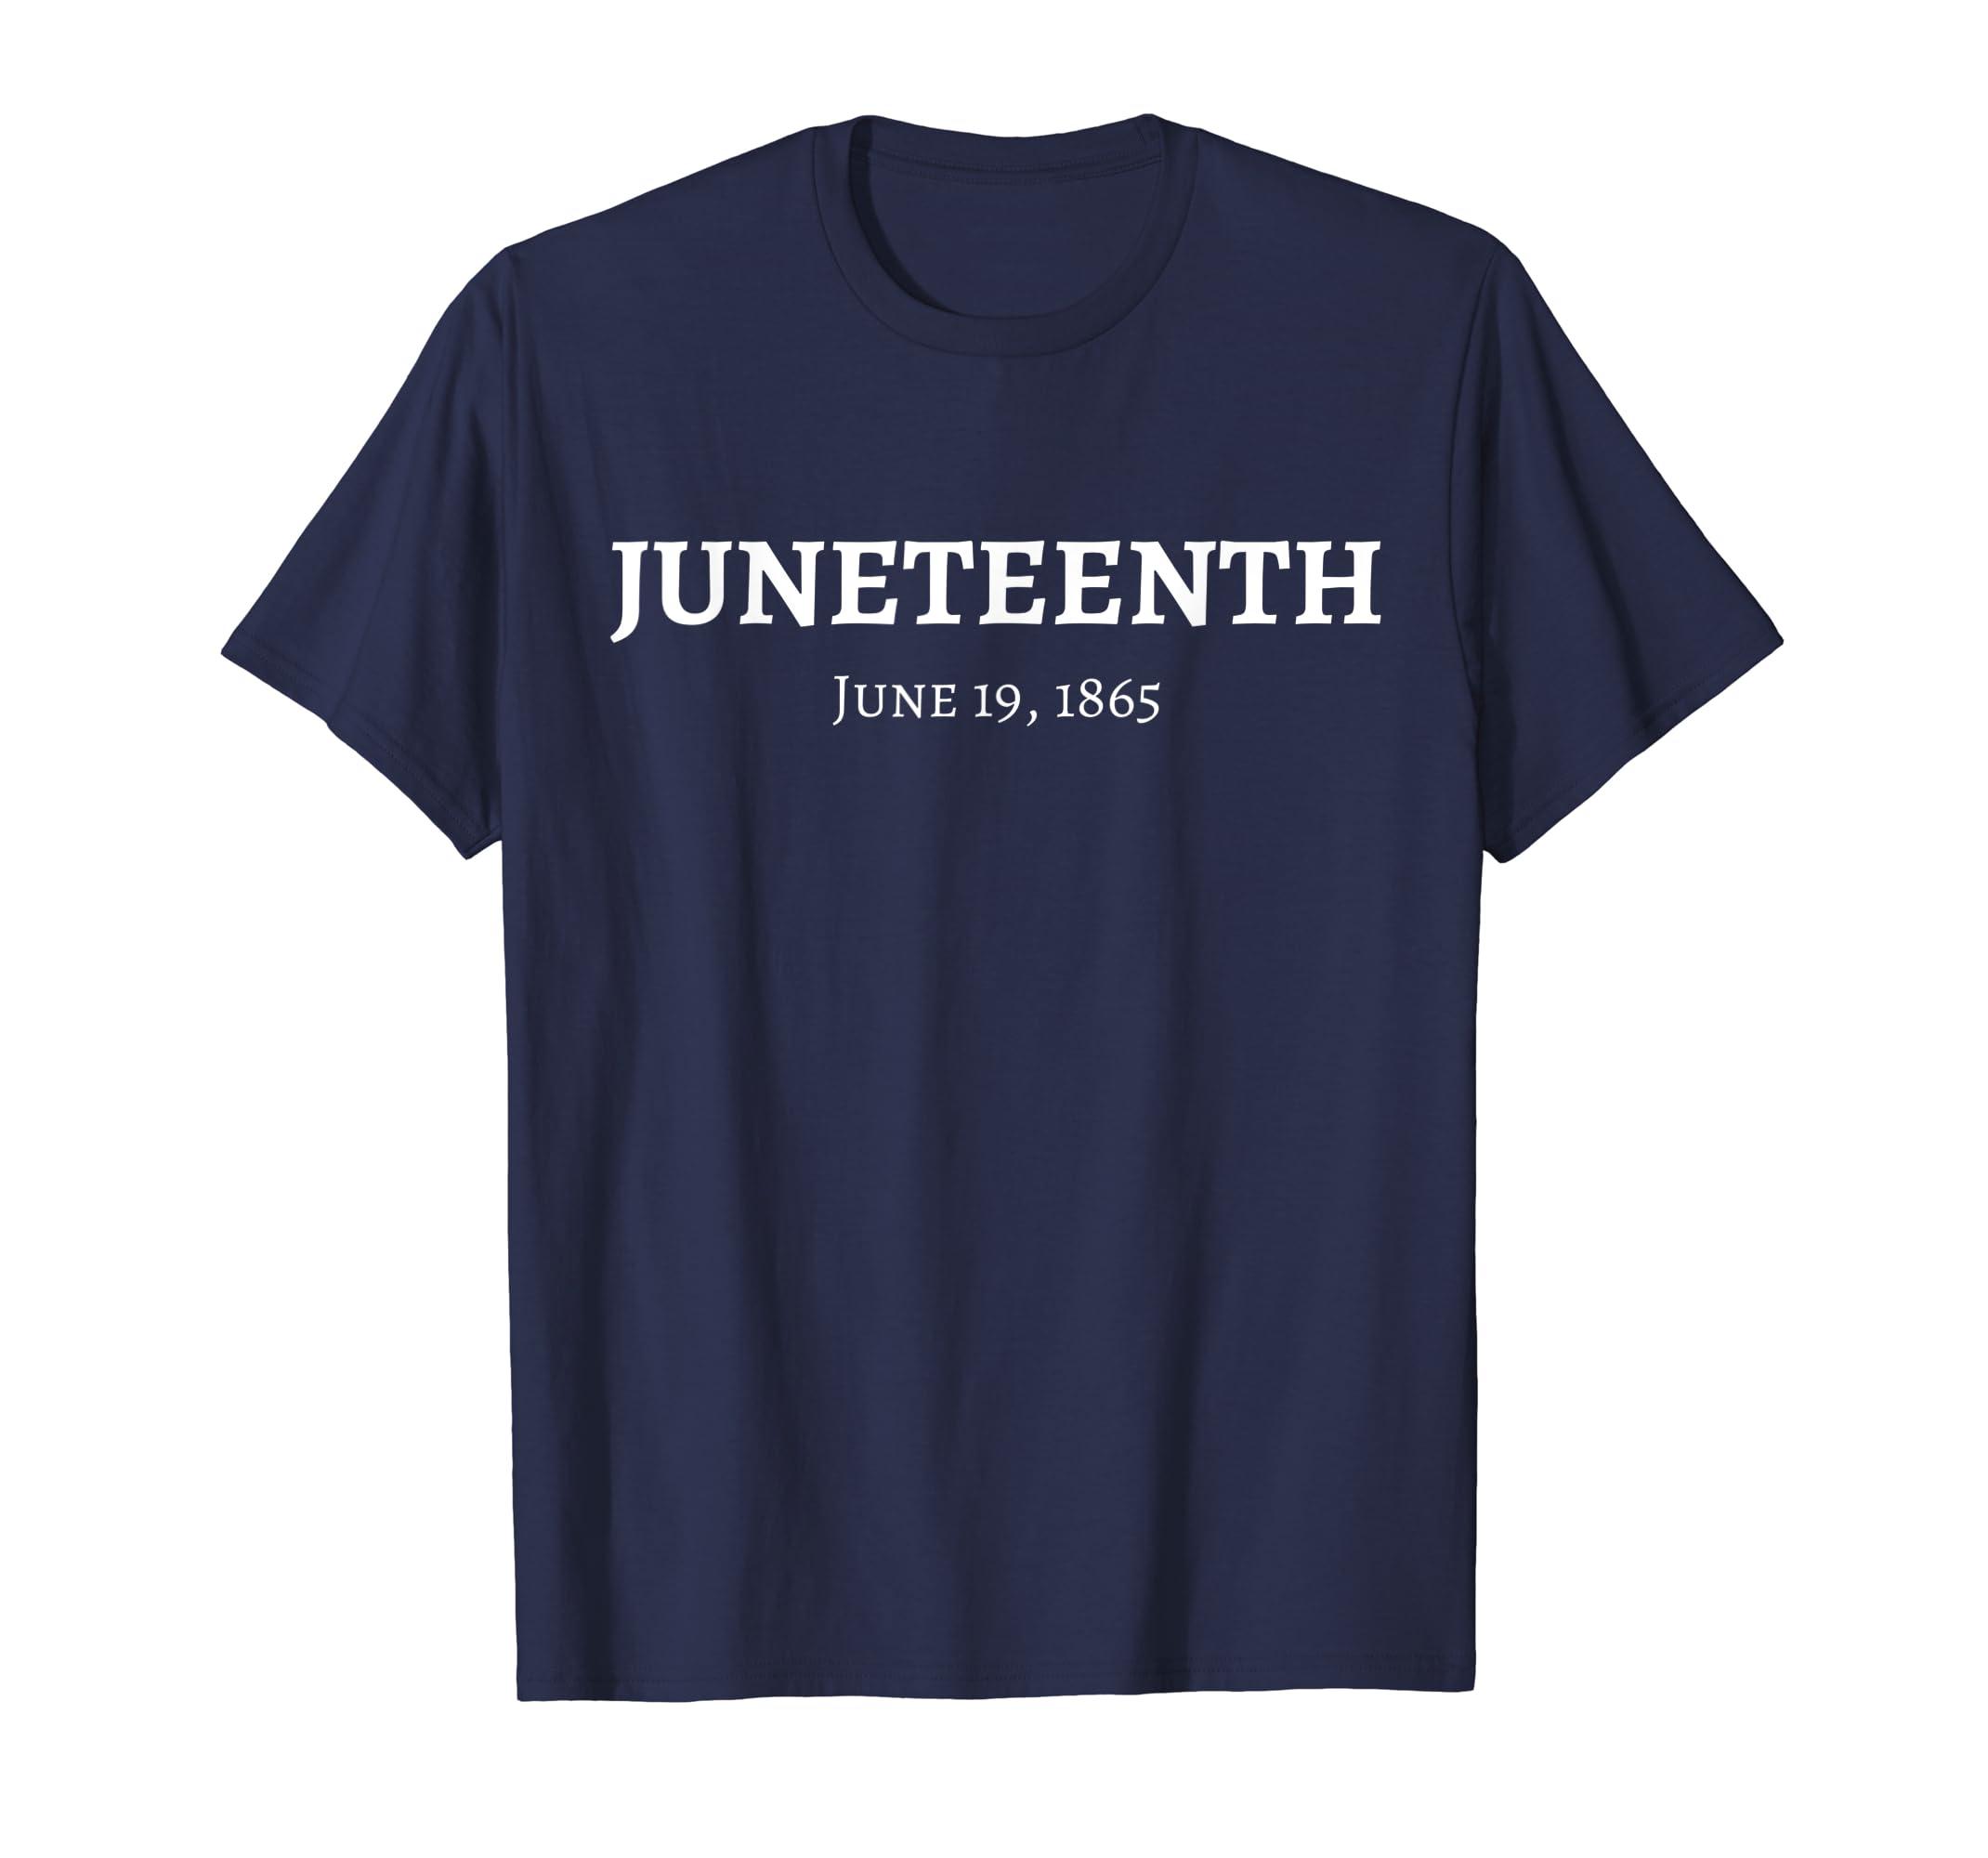 Juneteenth June 19,1865 Emancipation Day T-Shirt-SFL